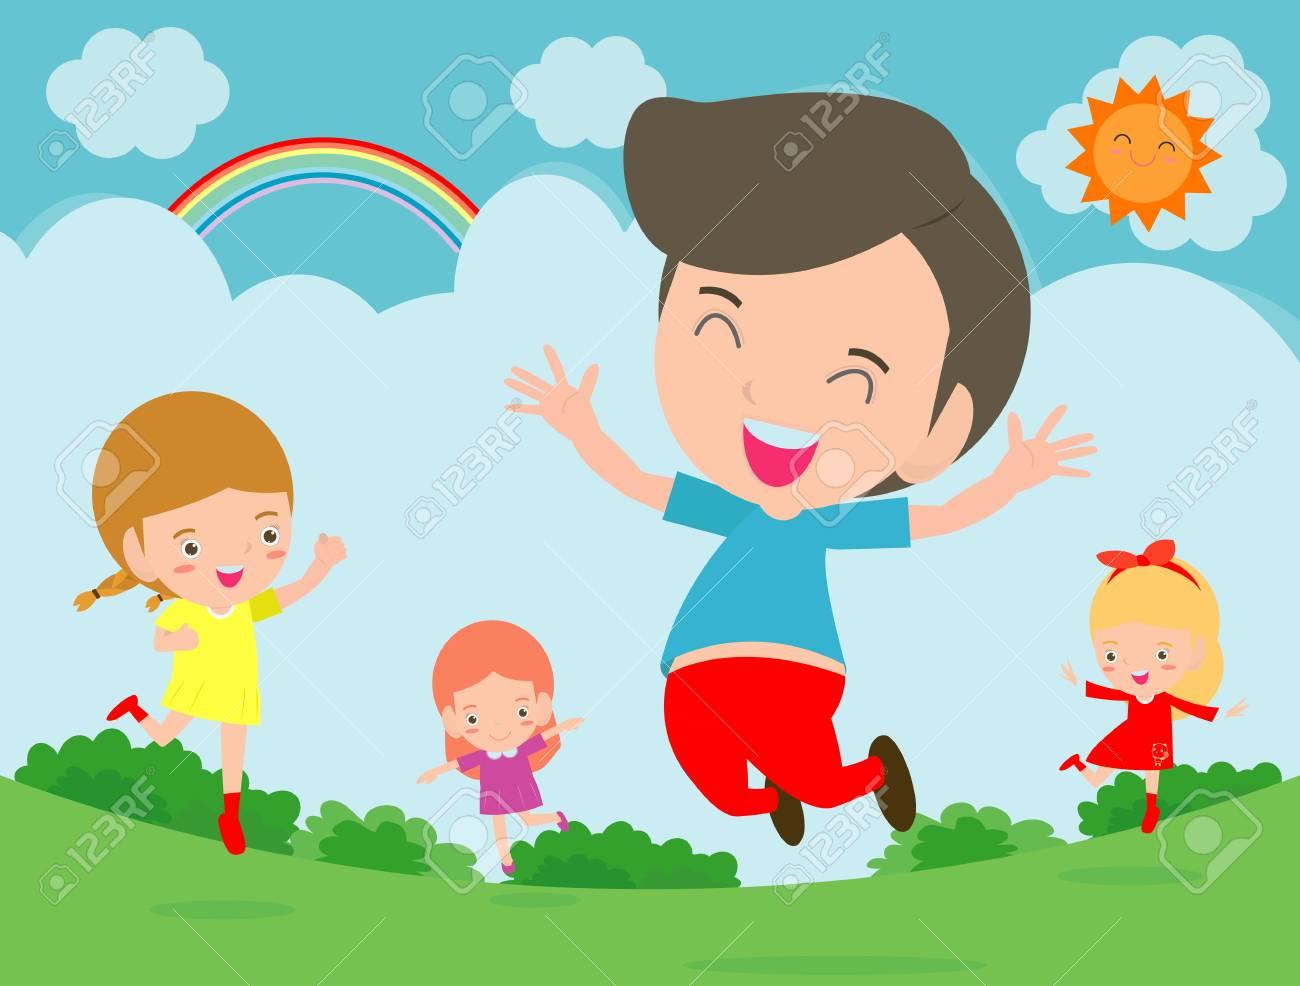 kids jumping with joy happy jumping kids happy cartoon child